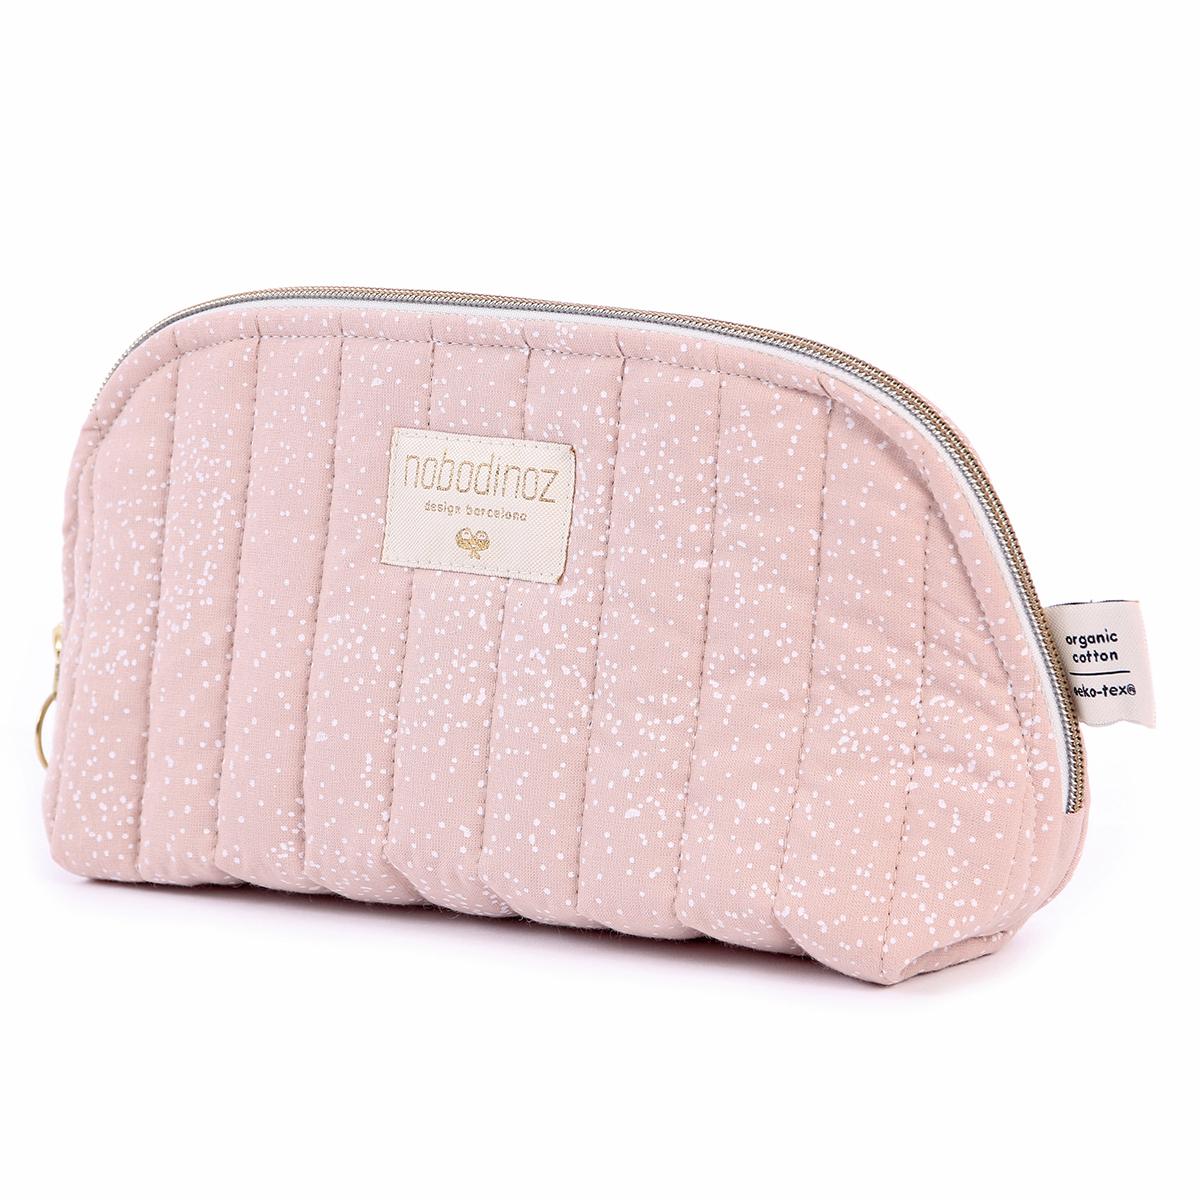 Trousse Trousse de Toilette Holiday - White Bubble & Misty Pink Trousse de Toilette Holiday - White Bubble & Misty Pink